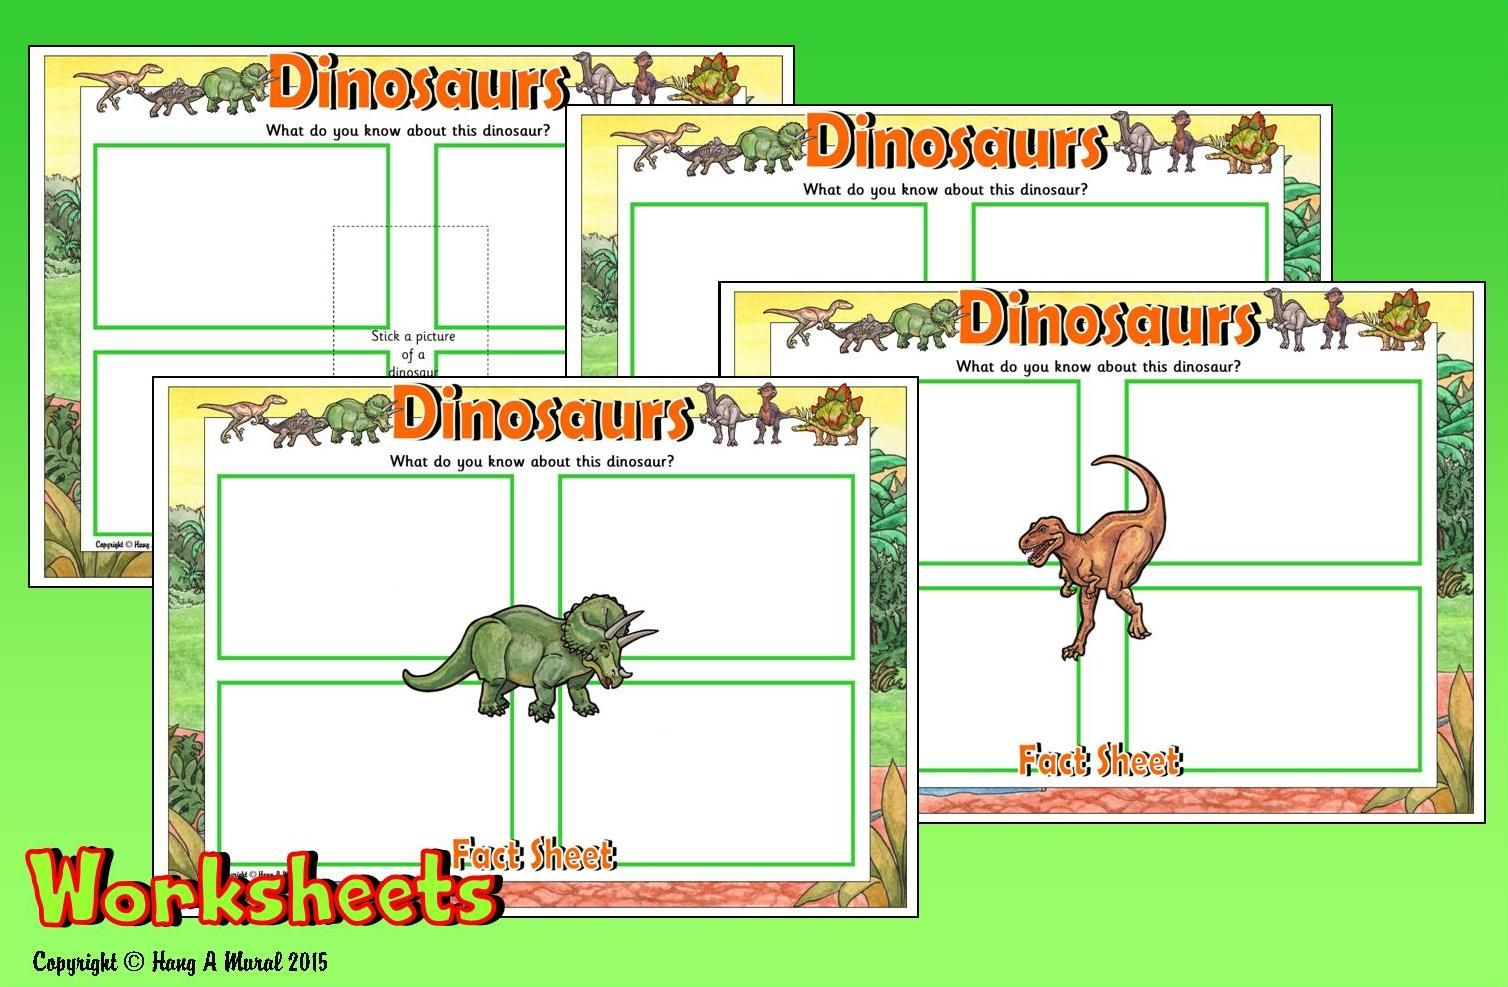 Dinosaurs Worksheets Free Sample Download At WwwHangAMuralCo